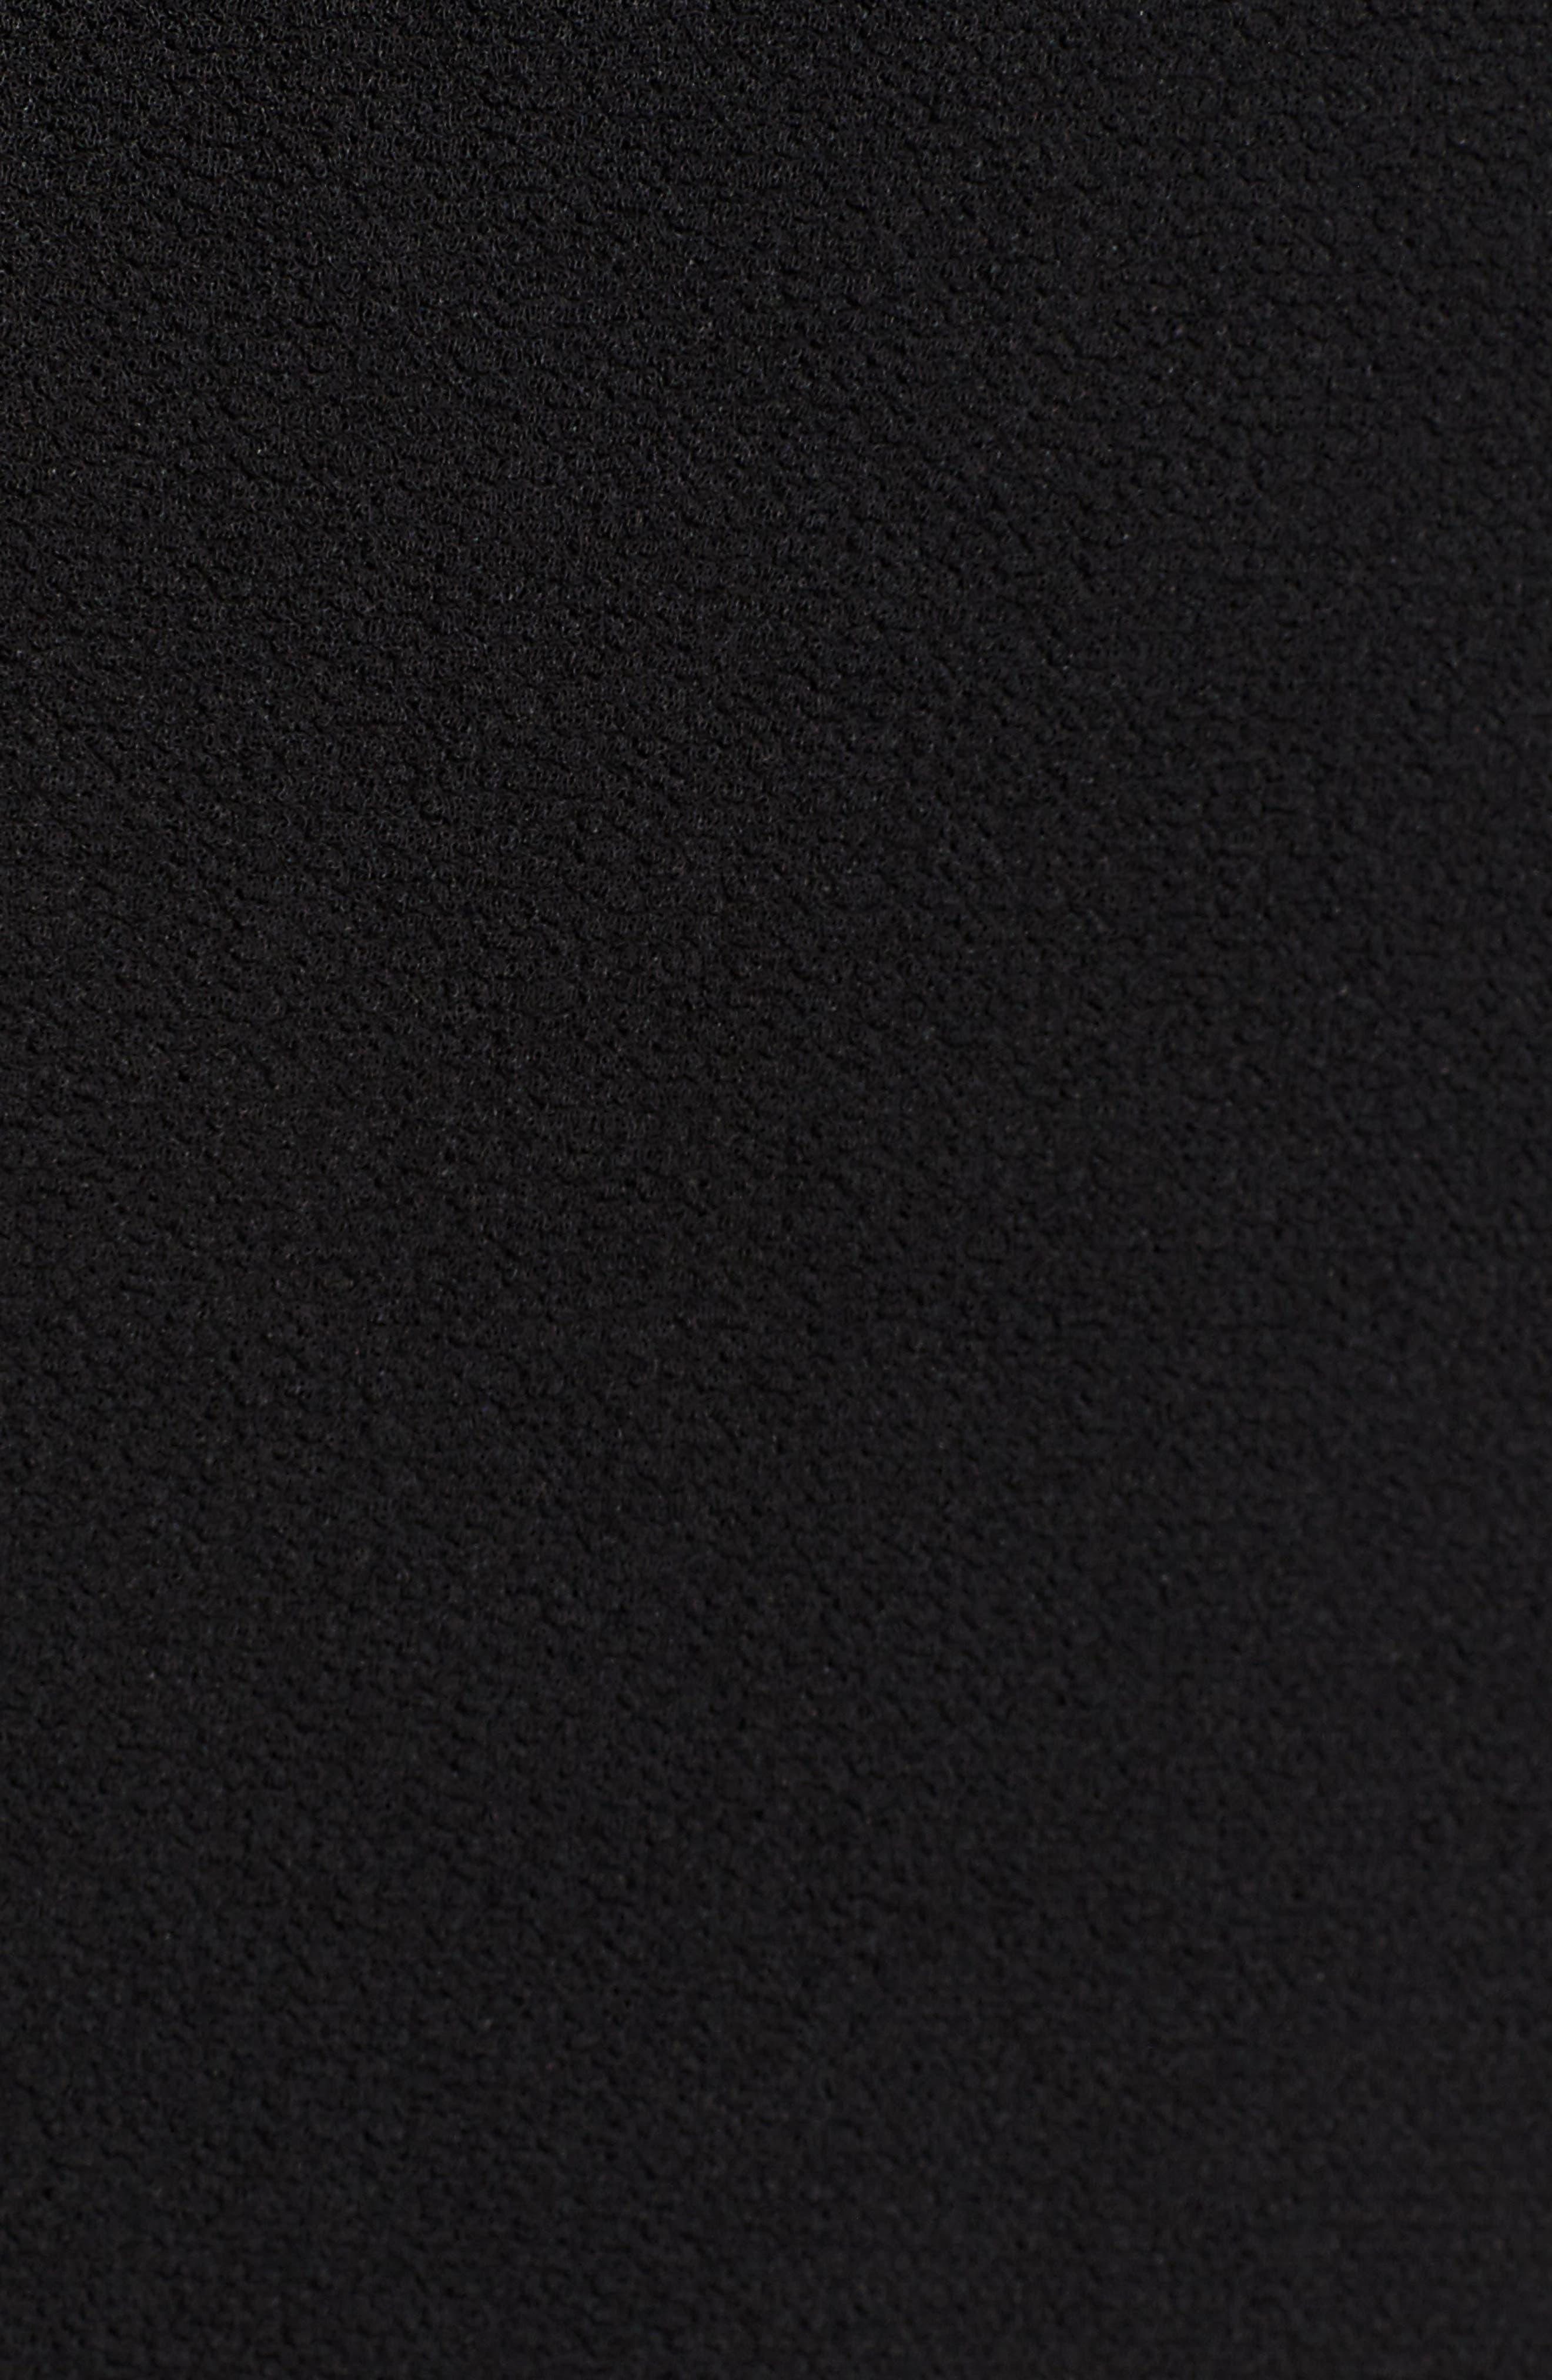 Ruffle Sweater Dress,                             Alternate thumbnail 6, color,                             BLACK/ WHITE